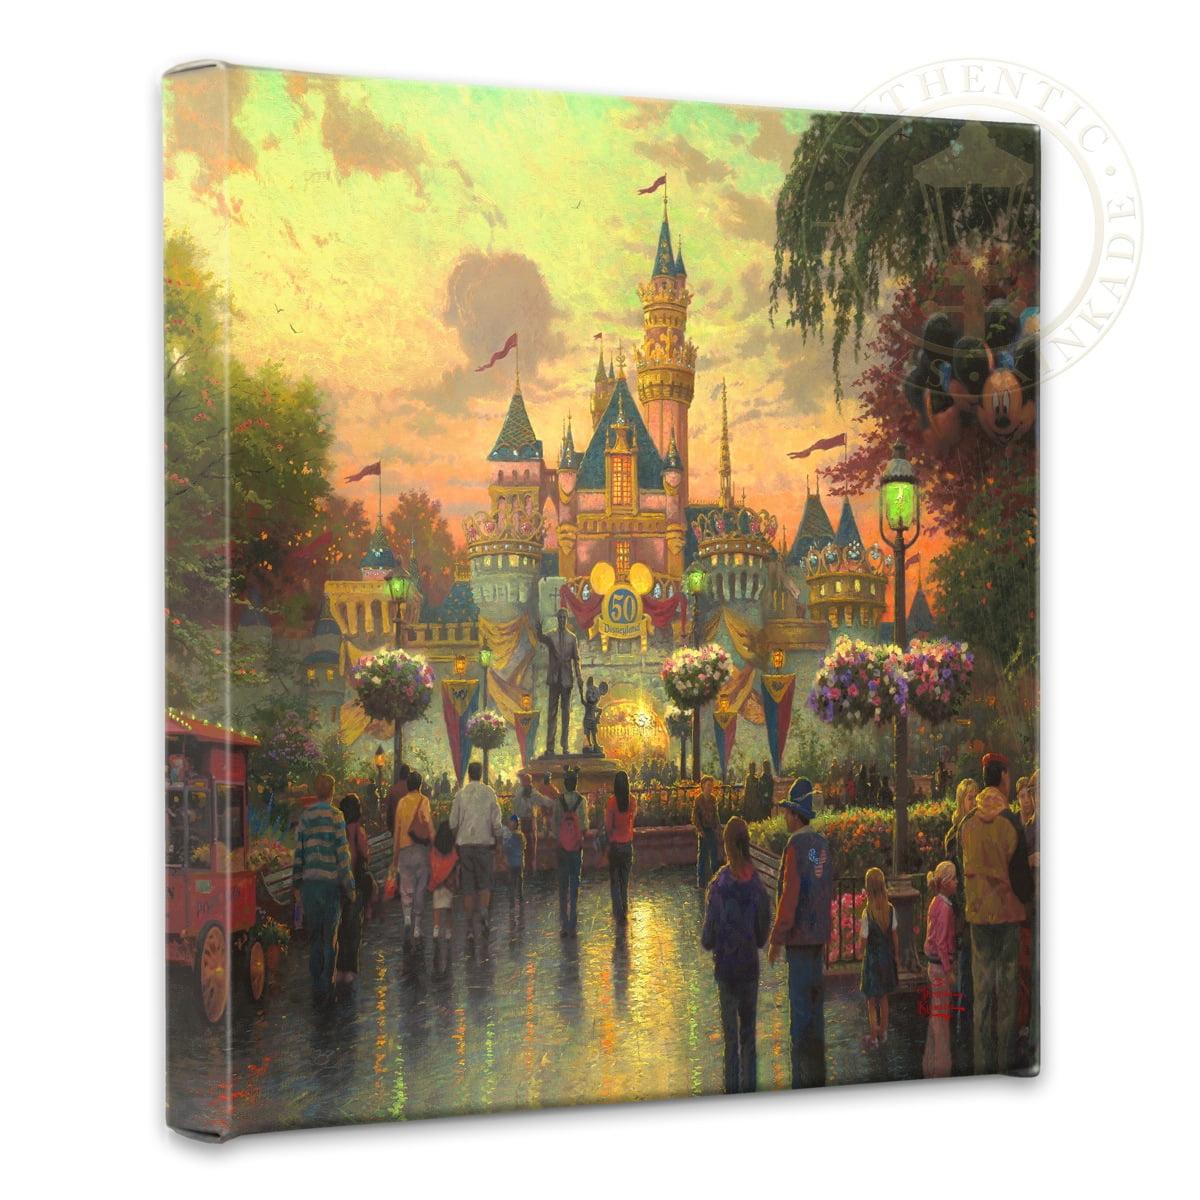 Thomas Kinkade Disneyland 50th Anniversary 14 x 14 Canvas Wrap